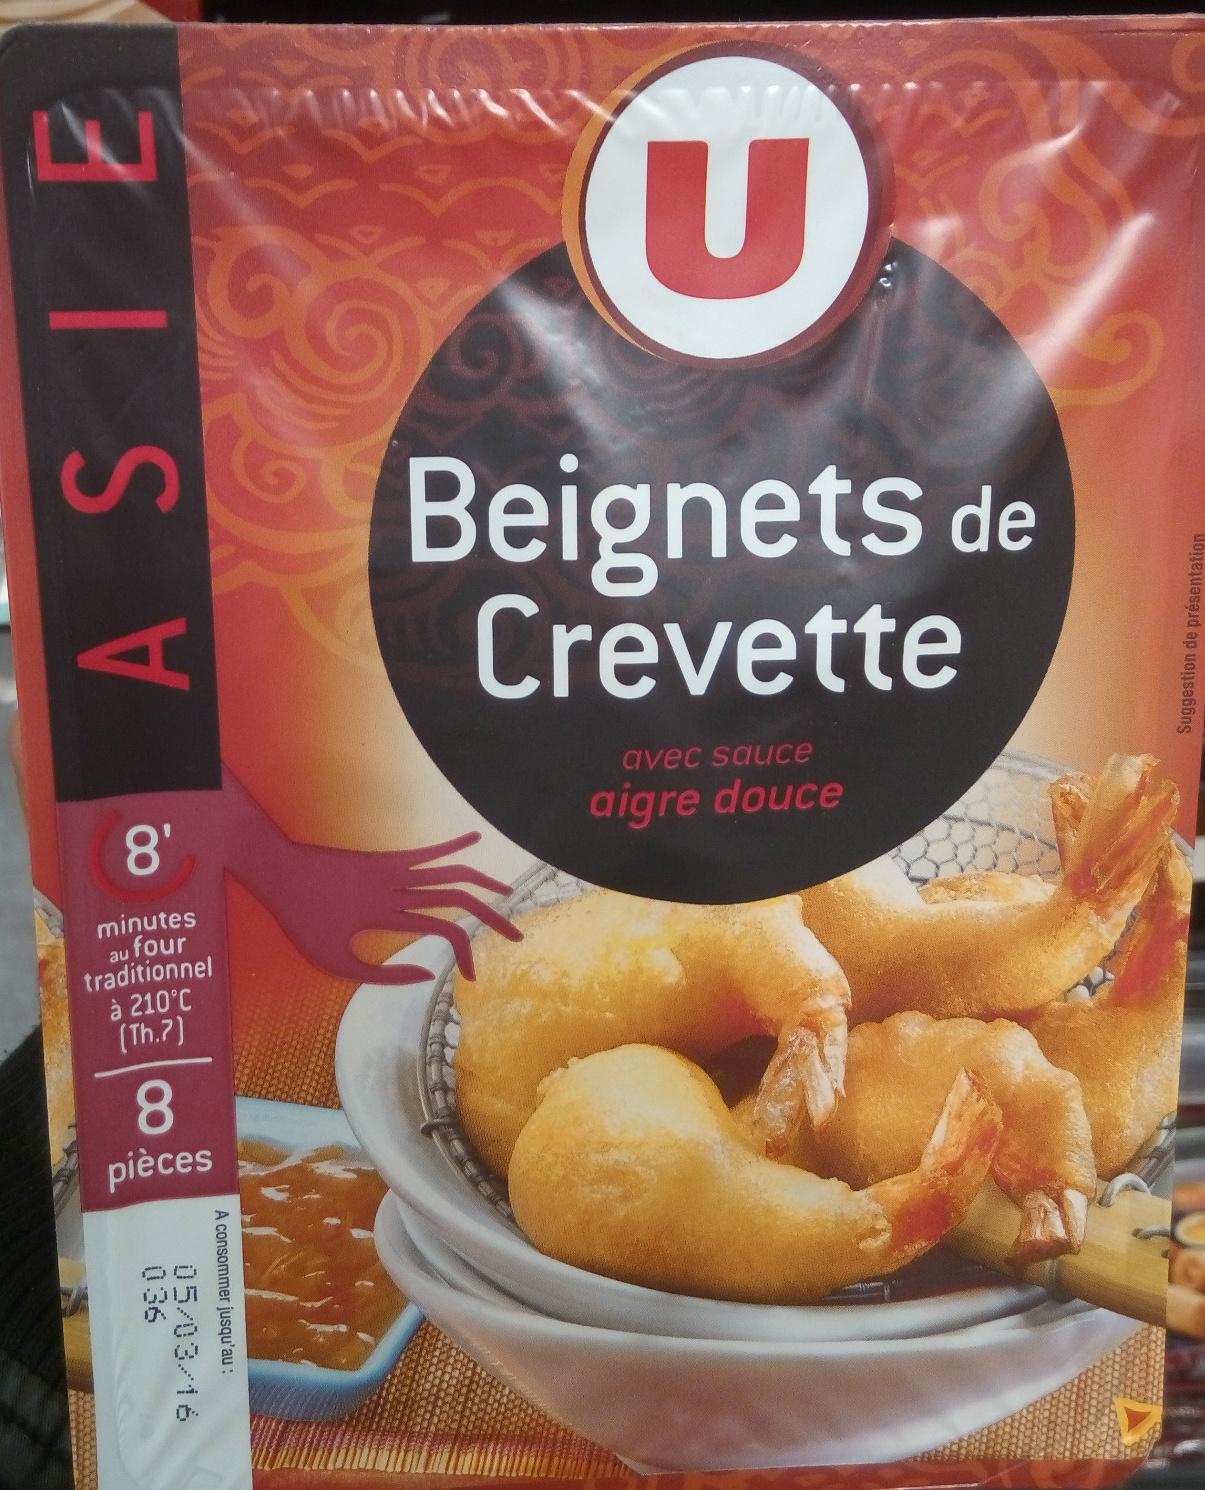 beignets de crevette u 160 g